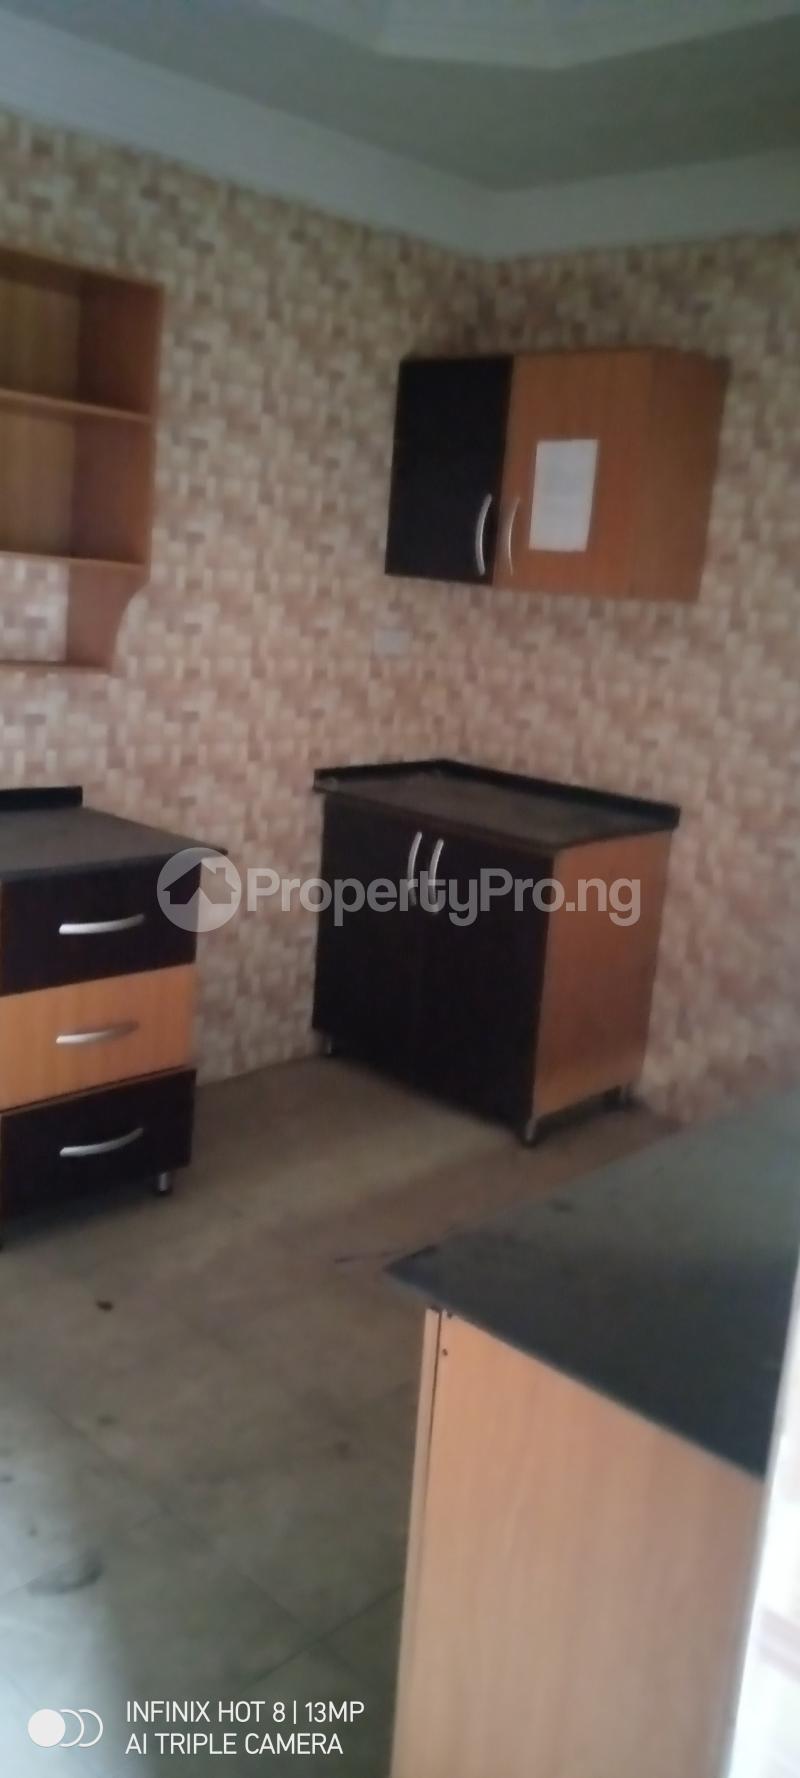 2 bedroom Flat / Apartment for rent Divine estate amuwo odofin Amuwo Odofin Lagos - 13